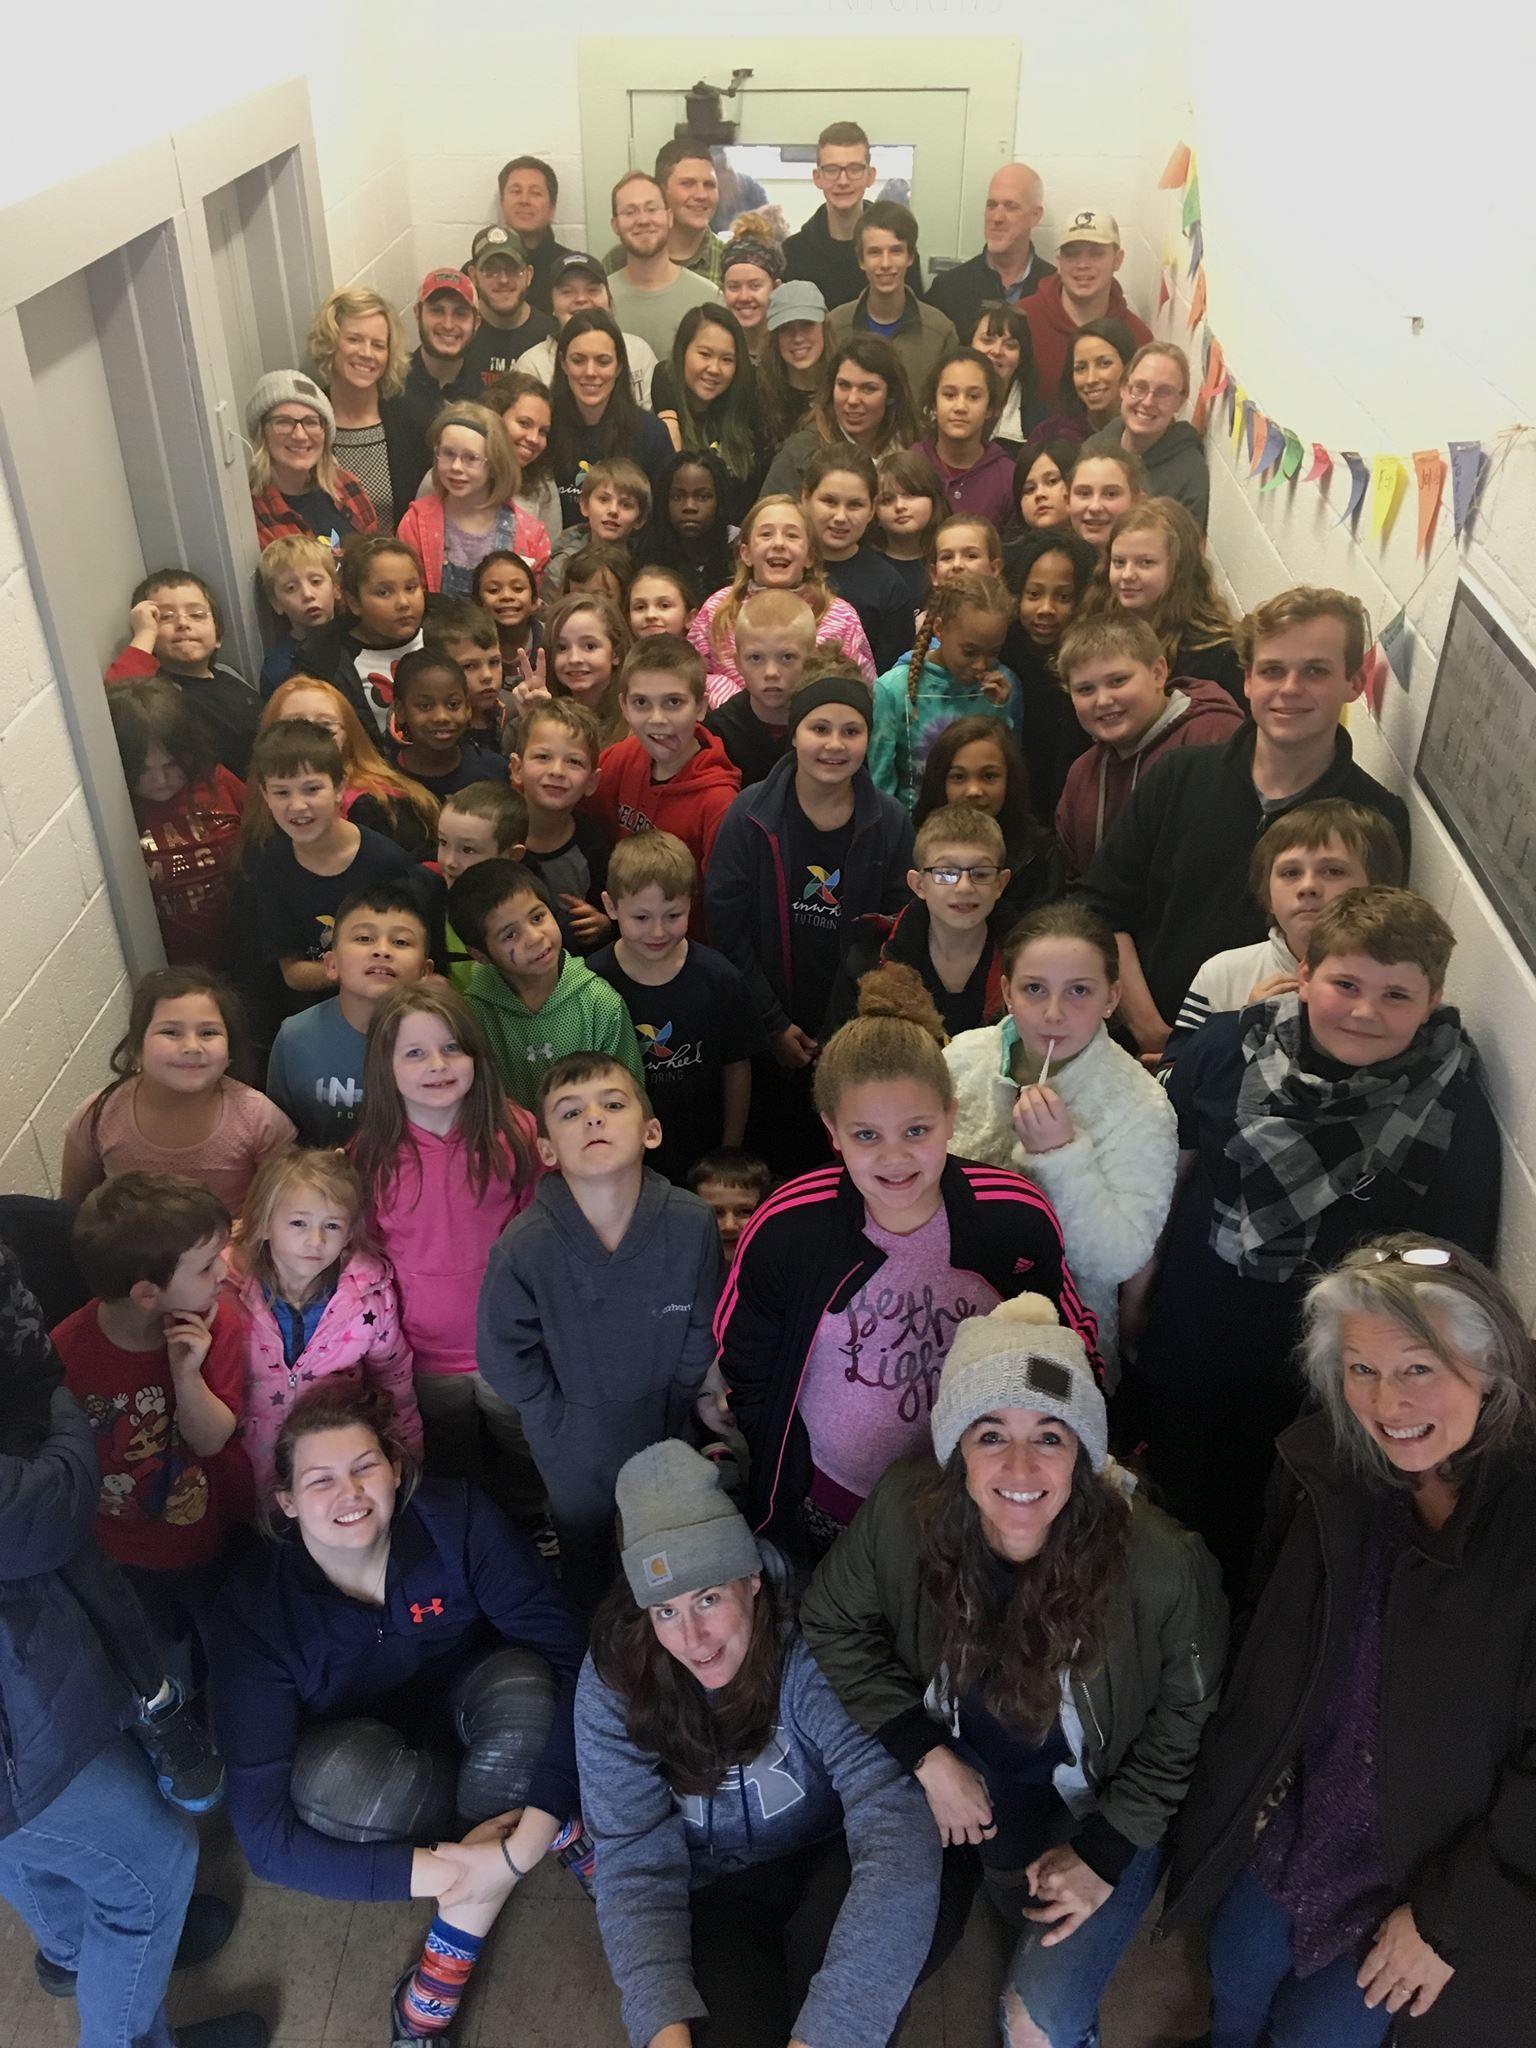 pinwheel tutors and students in new facility